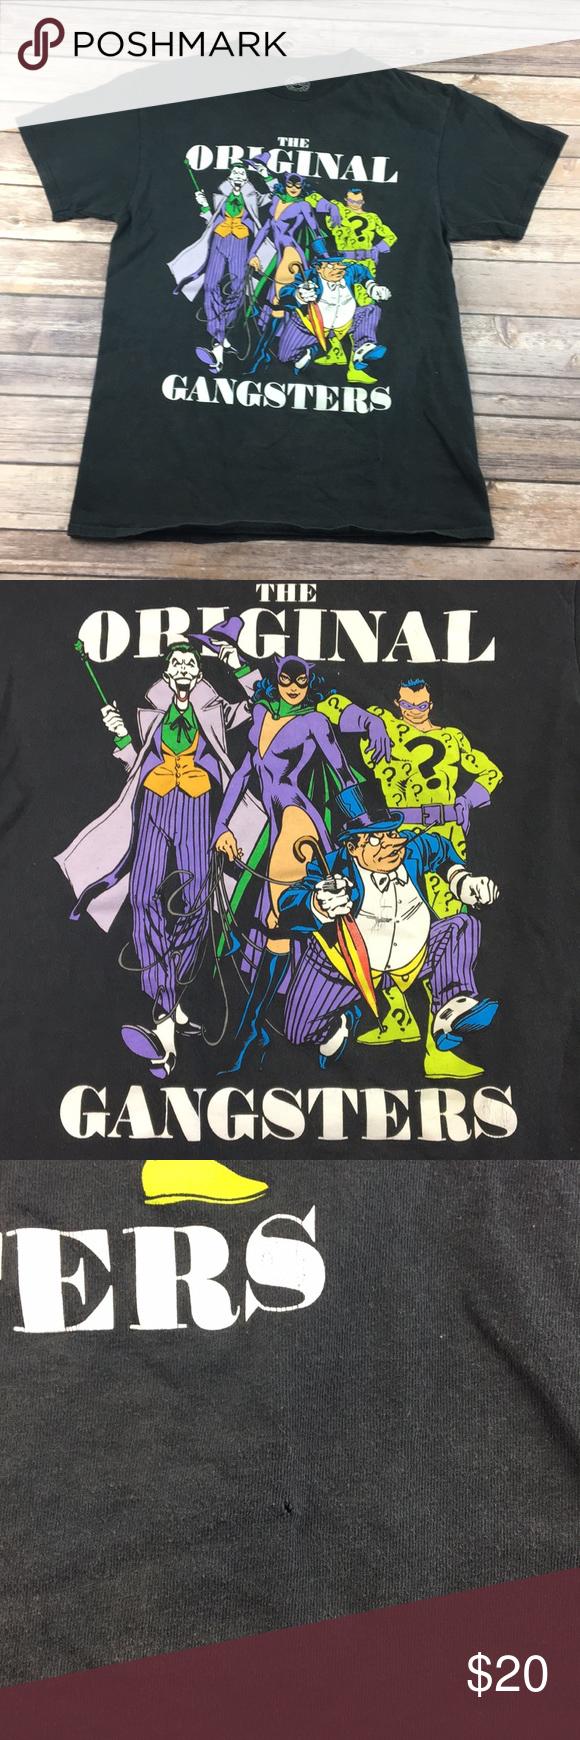 Gangster flannel shirts   dc comics original gangsters graphic tee  My Posh Picks